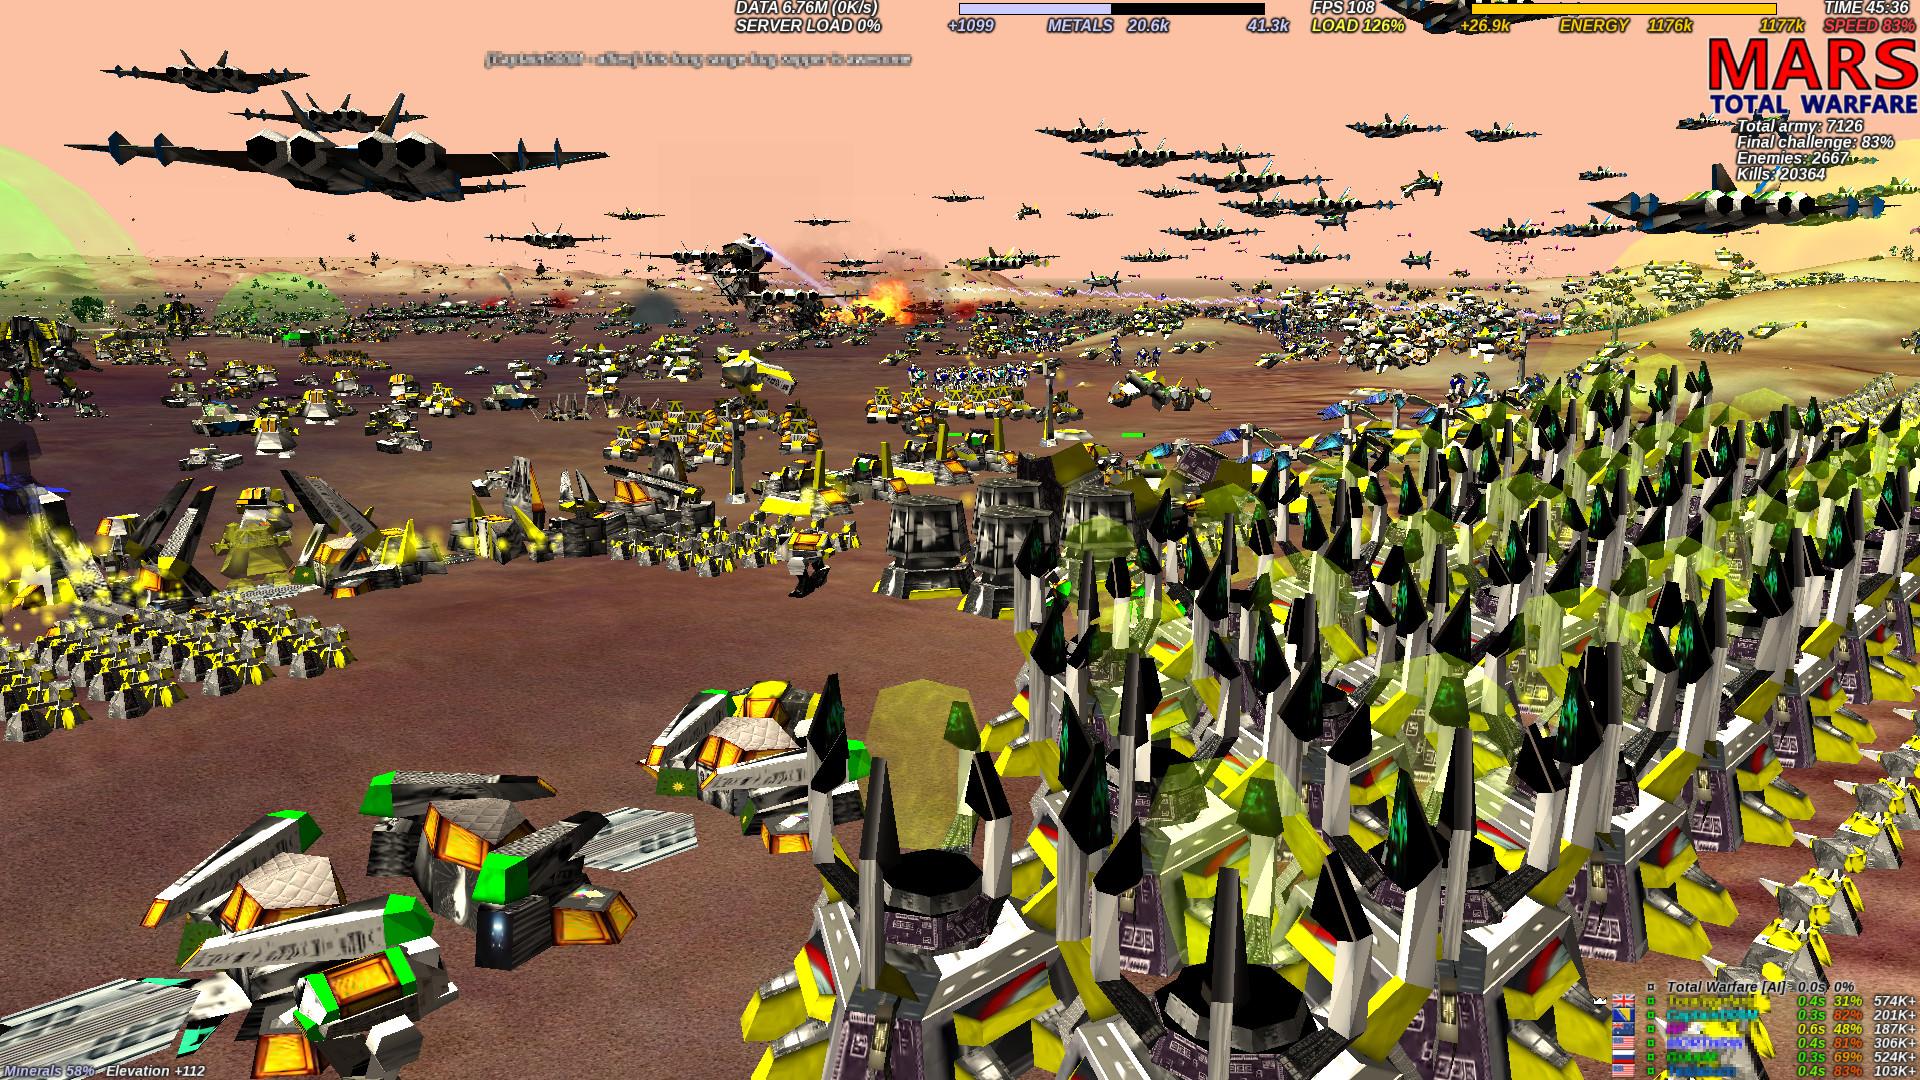 [MARS] Total Warfare screenshot